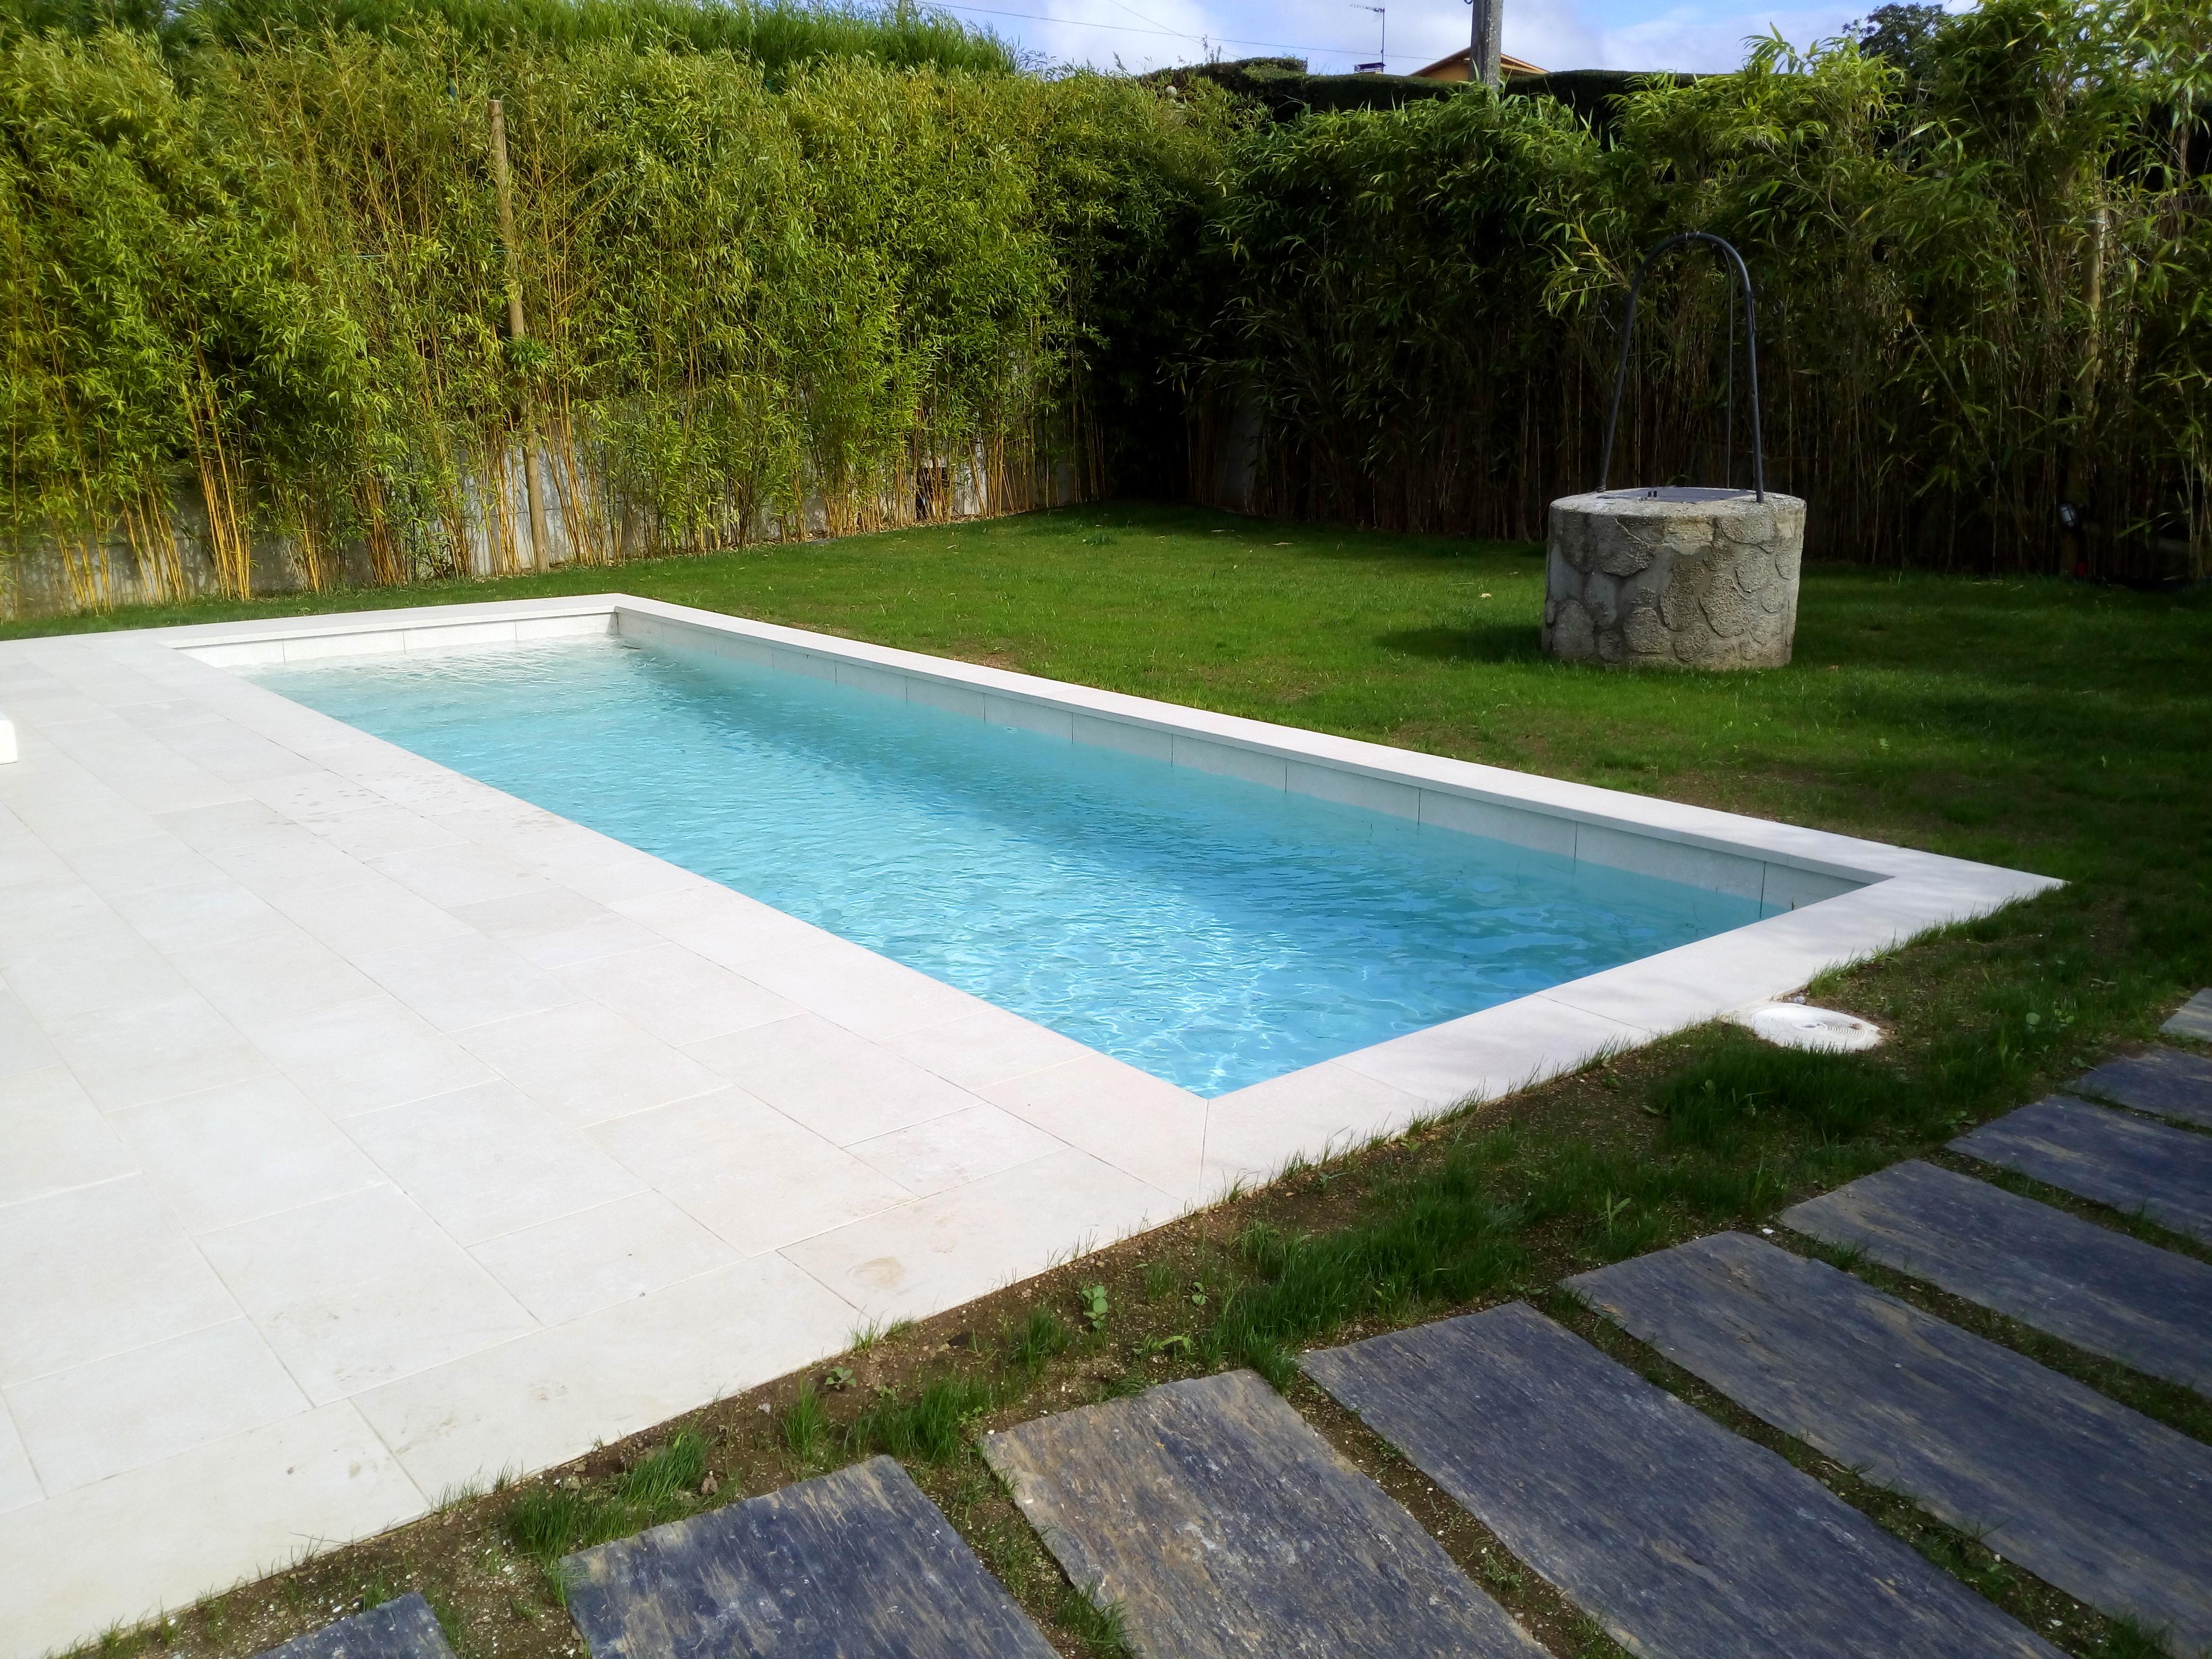 Ver galer a piscinas hormig n exteriores aguasport piscinas for Piscinas exteriores